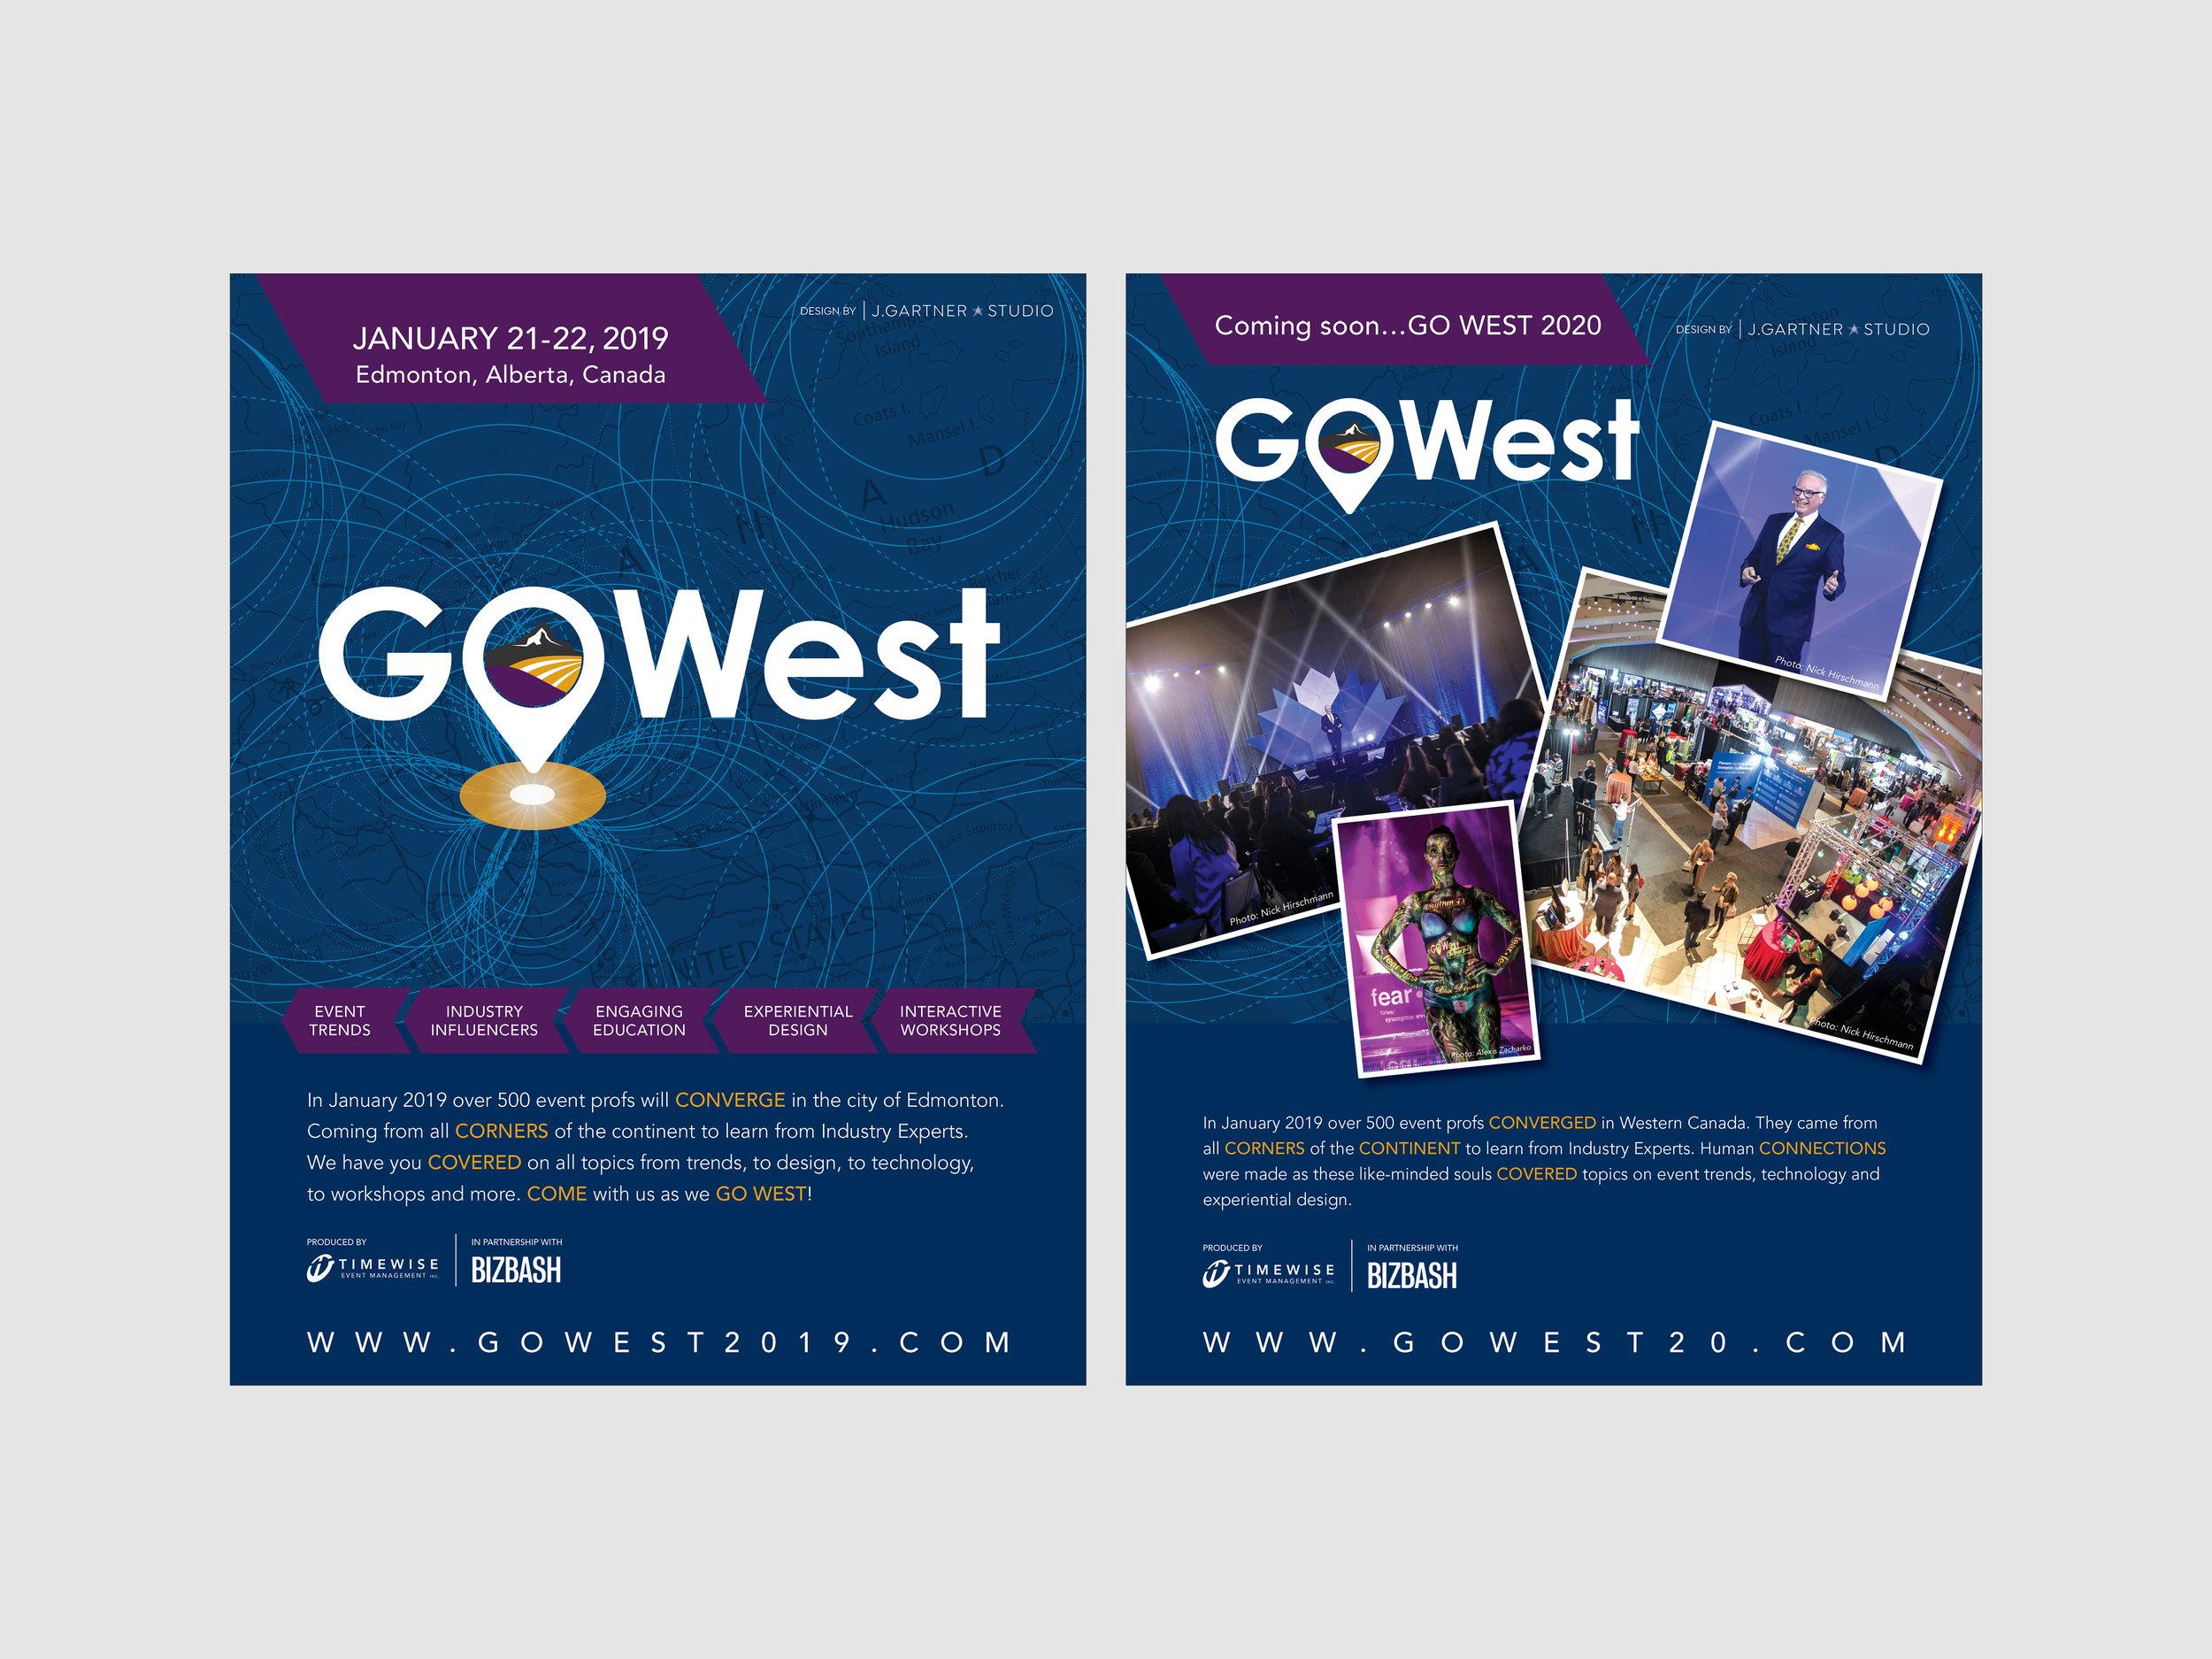 JGartner_portfolio_GoWest12.jpg